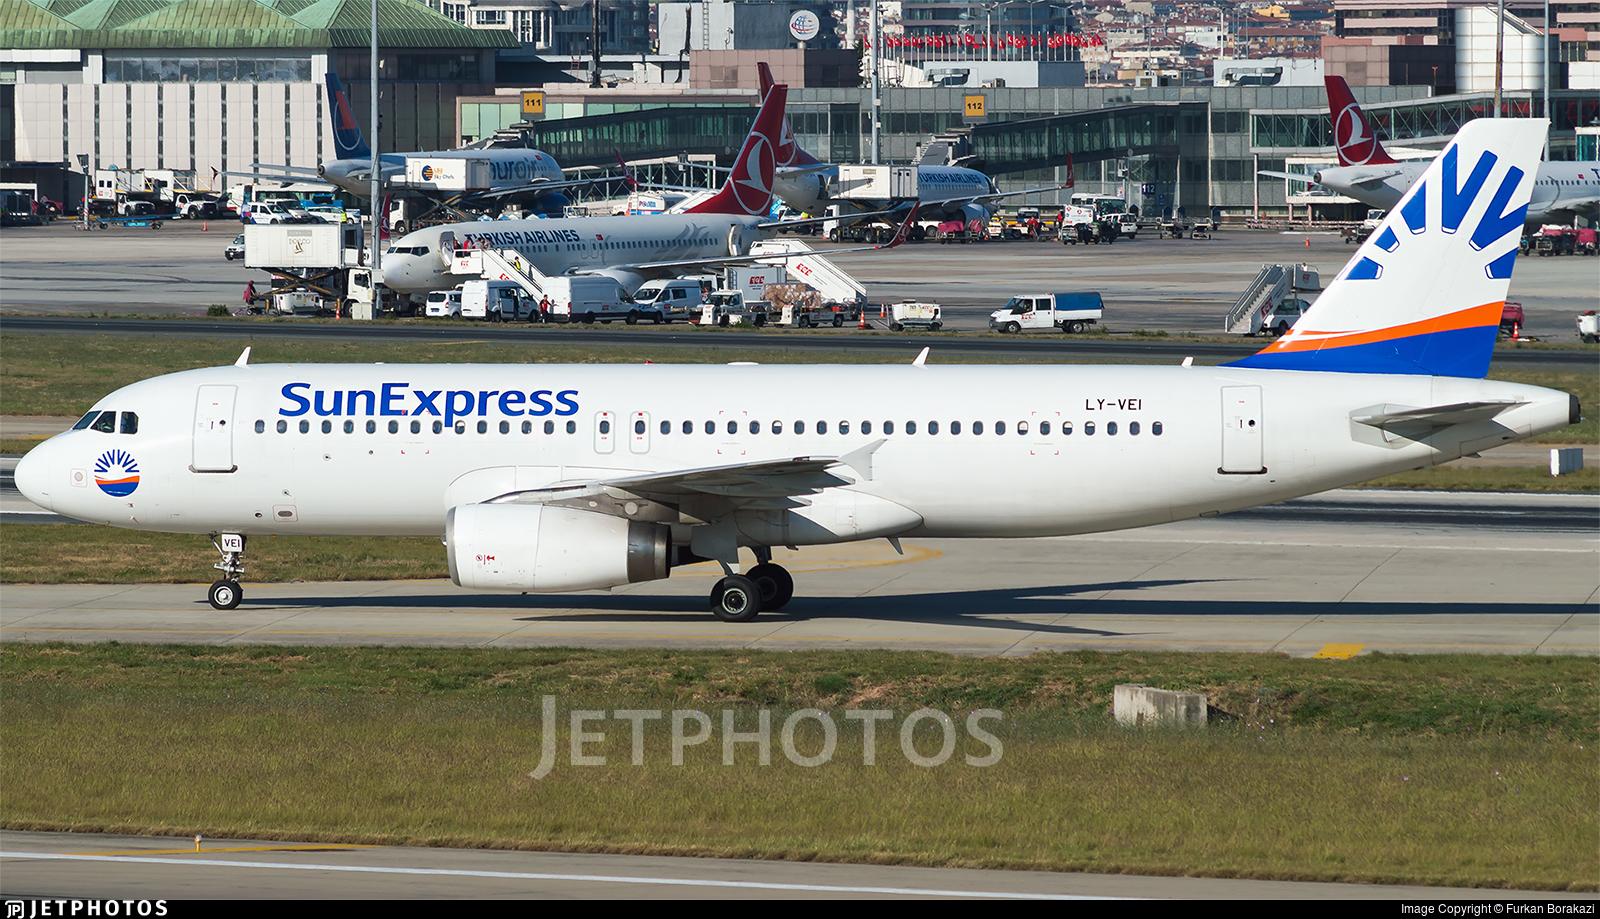 LY-VEI - Airbus A320-233 - SunExpress (Avion Express)